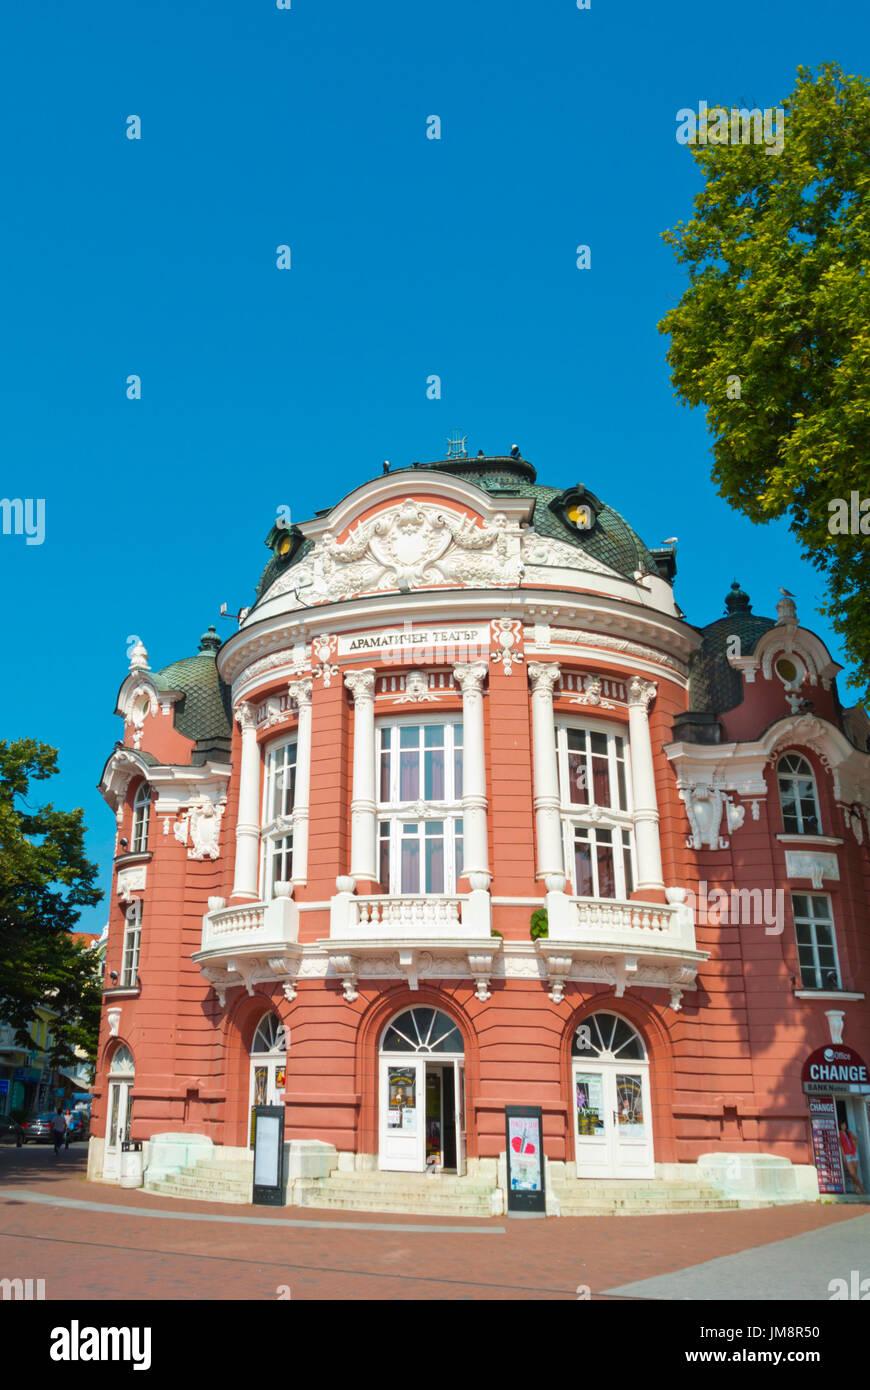 Drama Theatre Stoyan Bachvarov, Ploshtad Nezavisimost, Varna, Bulgaria - Stock Image